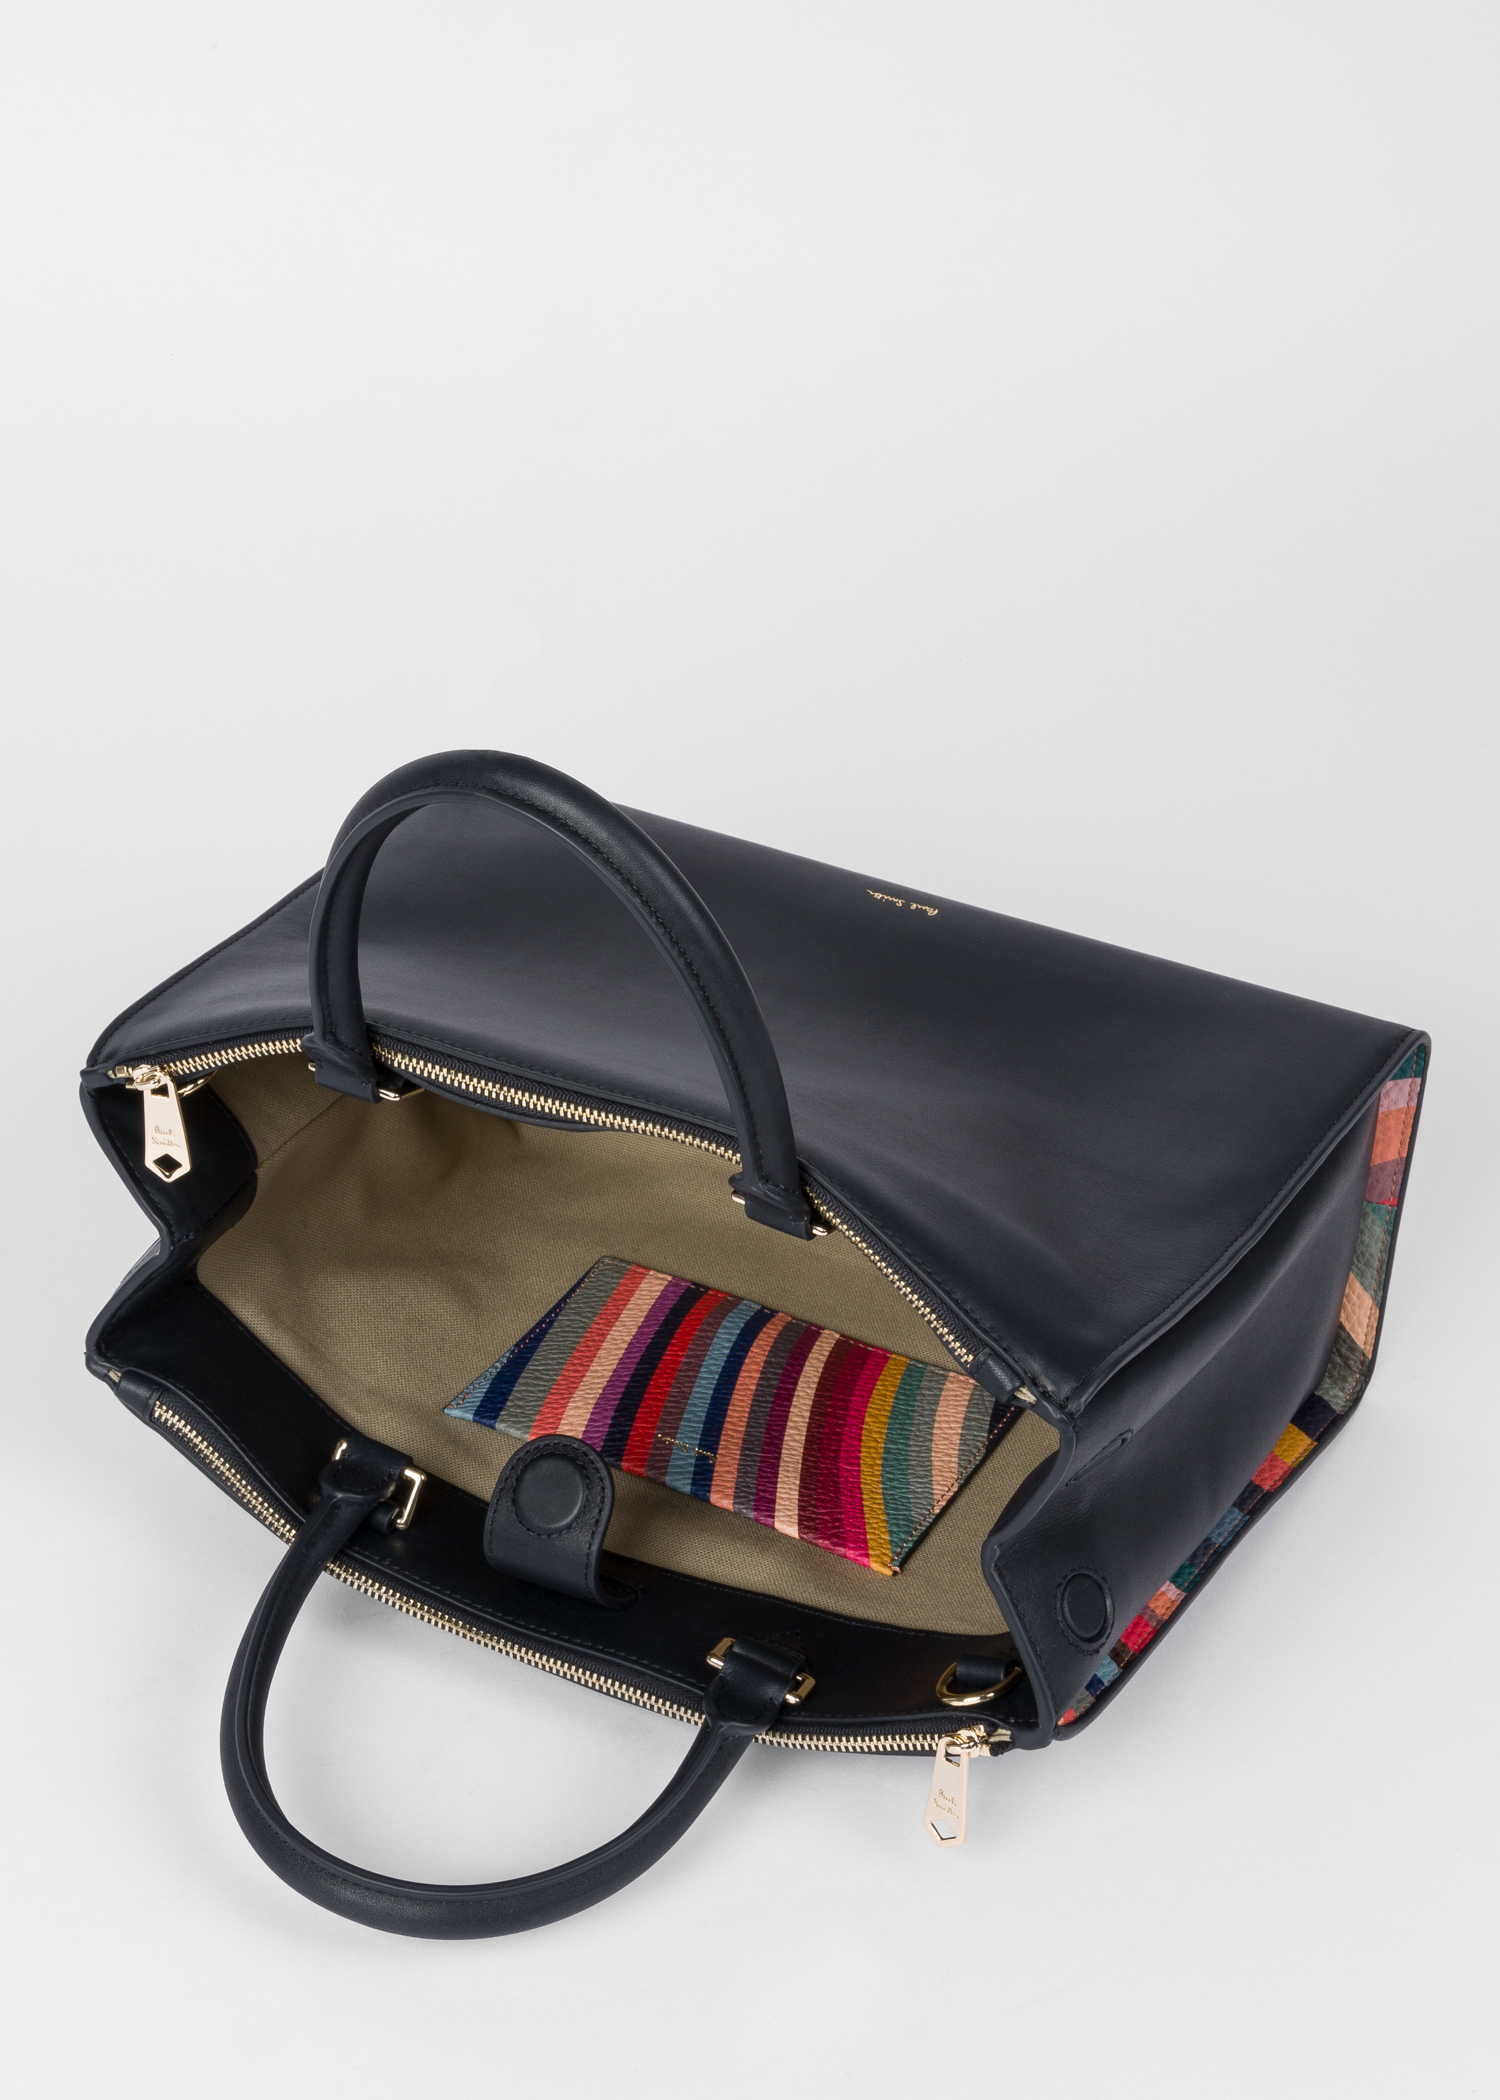 71225d20454c Internal View - Women s Navy  Swirl  Print Leather Tote Bag Paul Smith